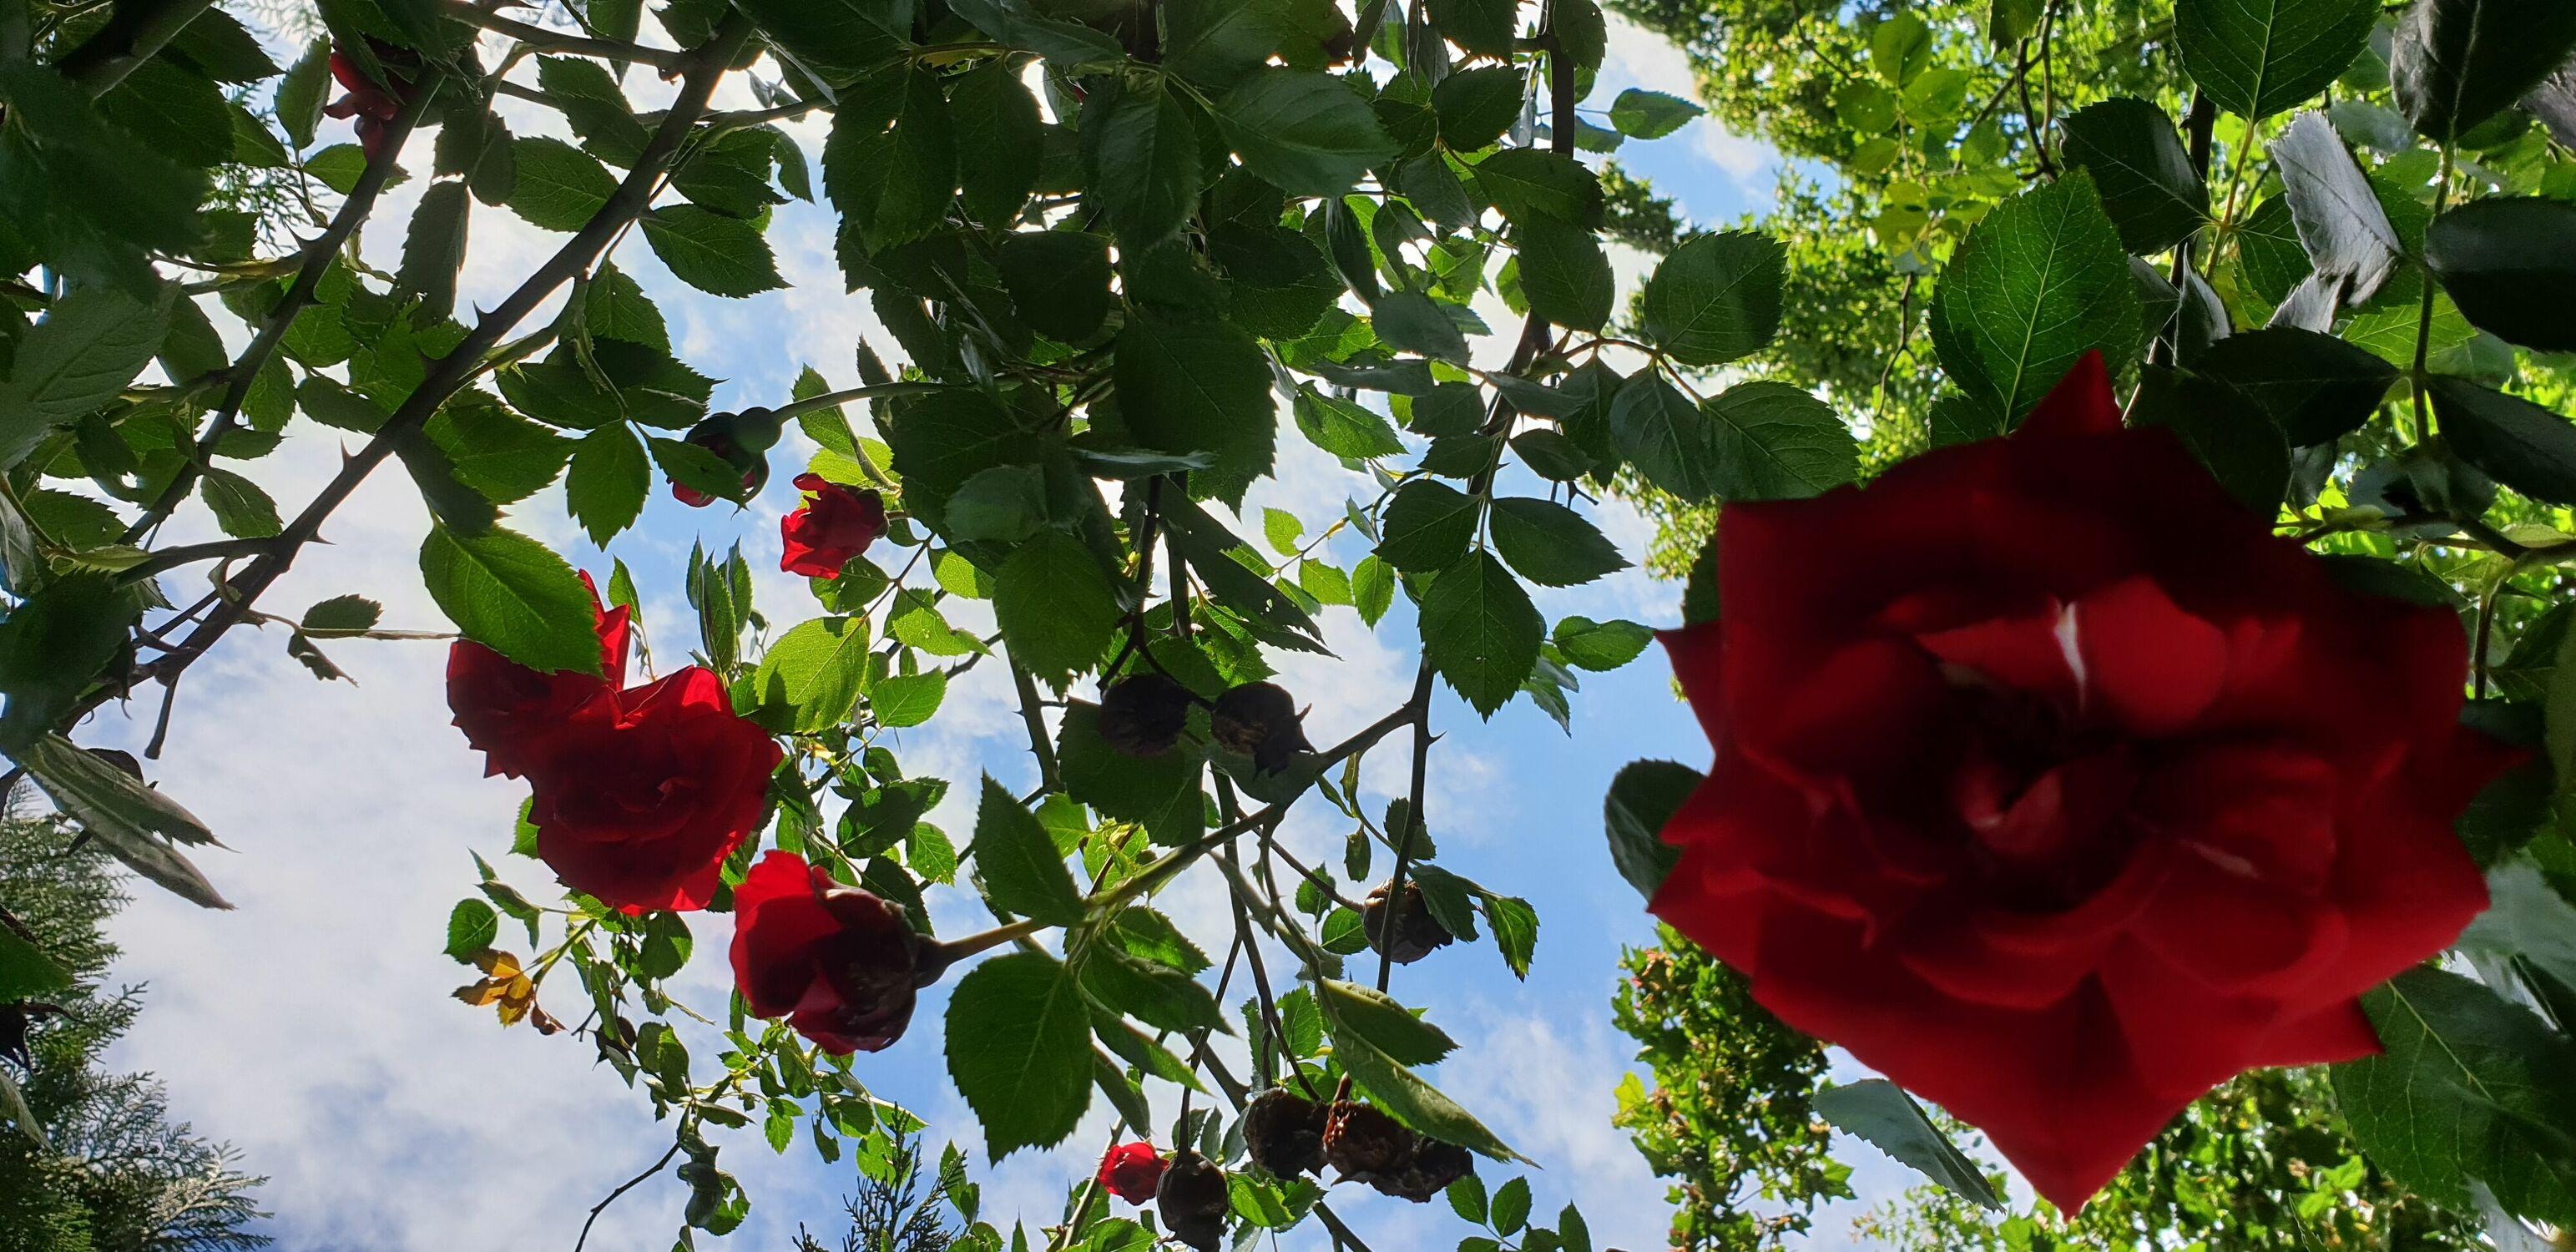 Bild mit Himmel, Rosen, Himmel Panorama, Rosenblüte, Rosengewächse, Blauer Himmel, rote Rosen